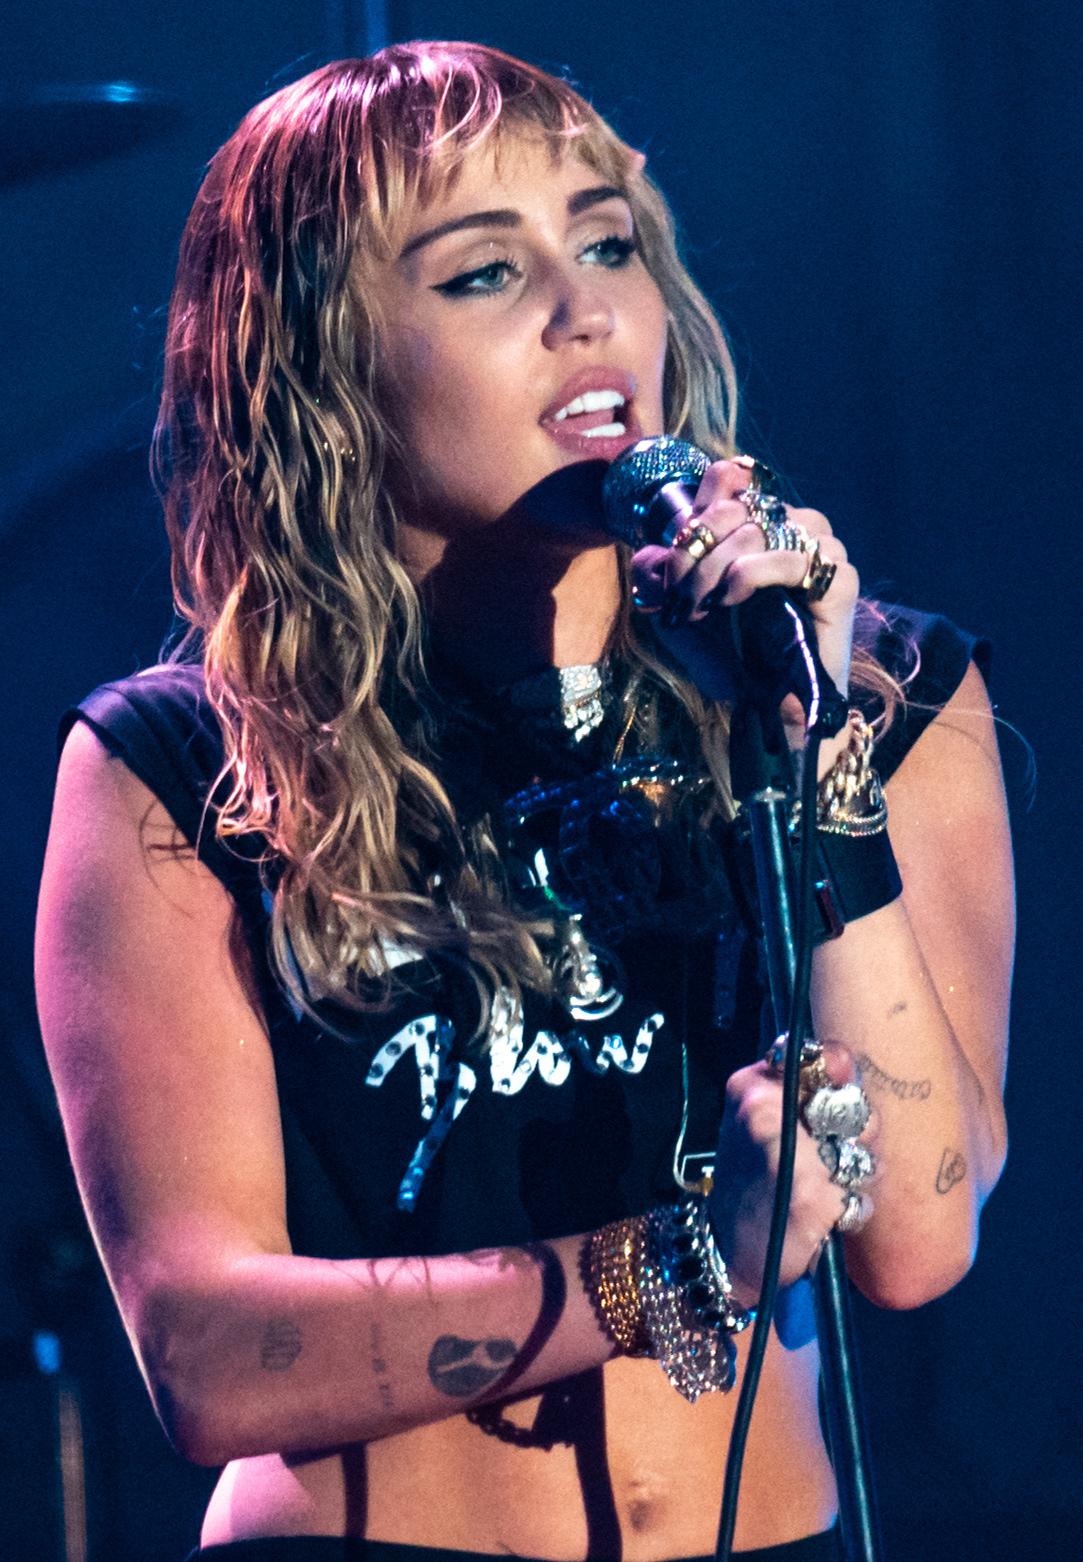 Miley Cyrus Wikipedia